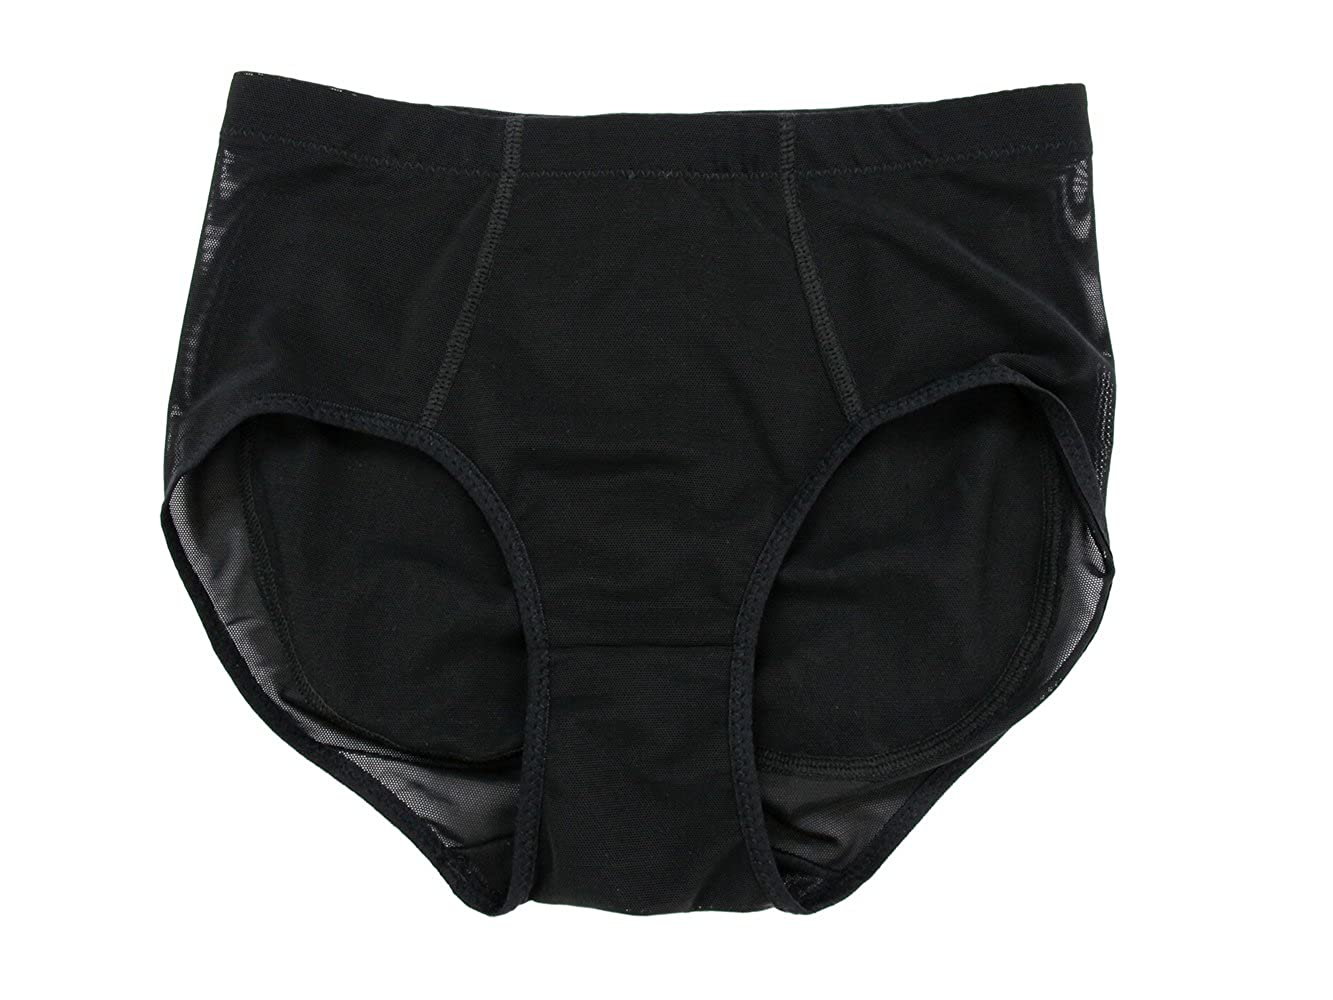 82ca7f149dc BB Silicone Padded Panty LoveMyBubbles Set at Amazon Women s Clothing store